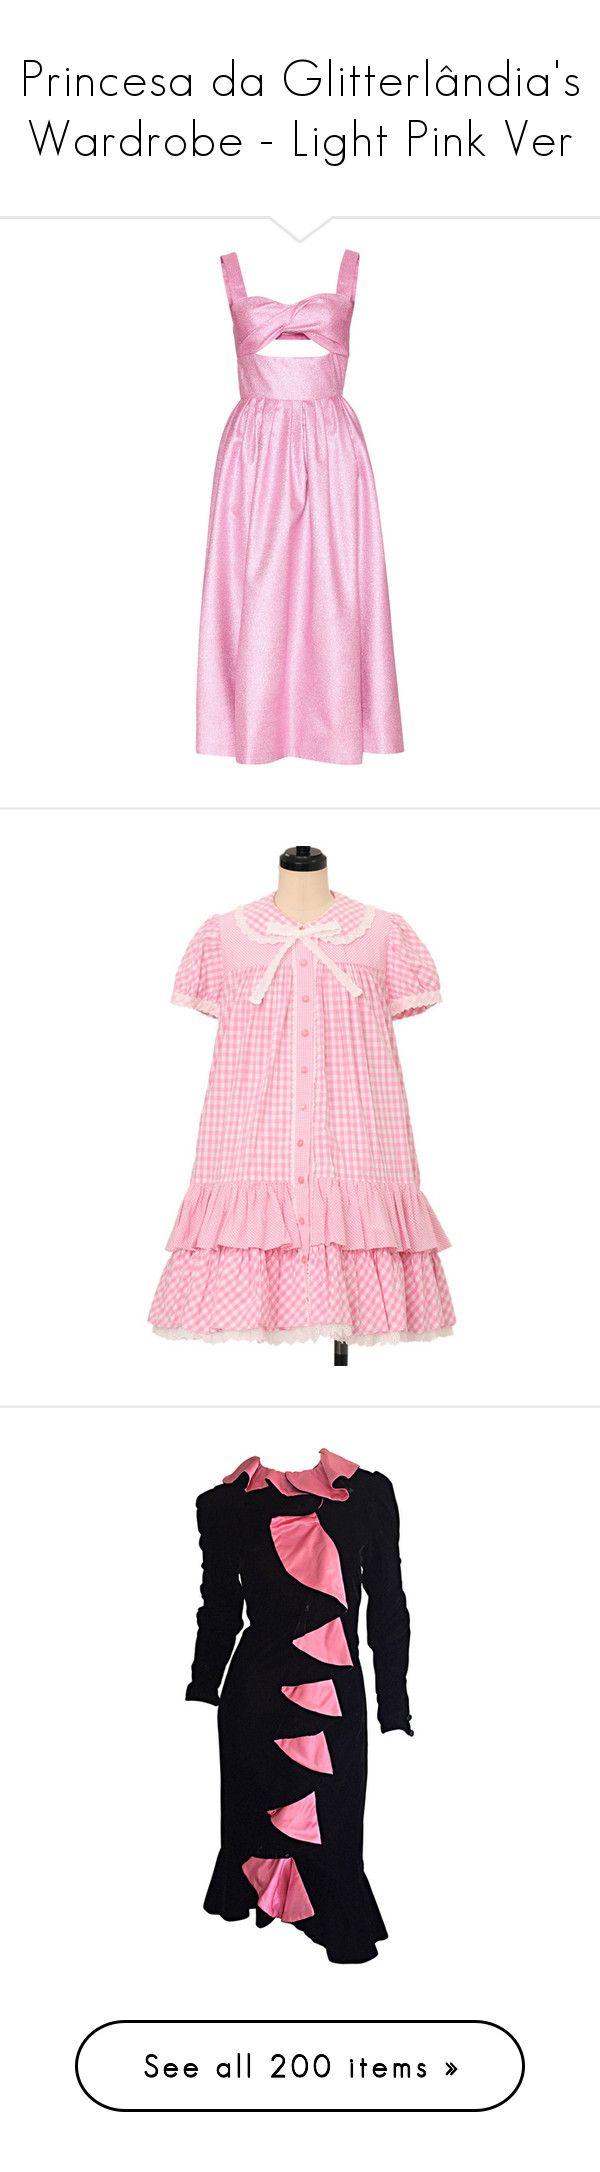 """Princesa da Glitterlândia's Wardrobe - Light Pink Ver"" by everysimpleplan ❤ liked on Polyvore featuring dresses, pink, pink cocktail dress, metallic dress, rosie assoulin dress, metallic cocktail dress, pink dress, velvet cocktail dress, pink long sleeve dress and collar dress"